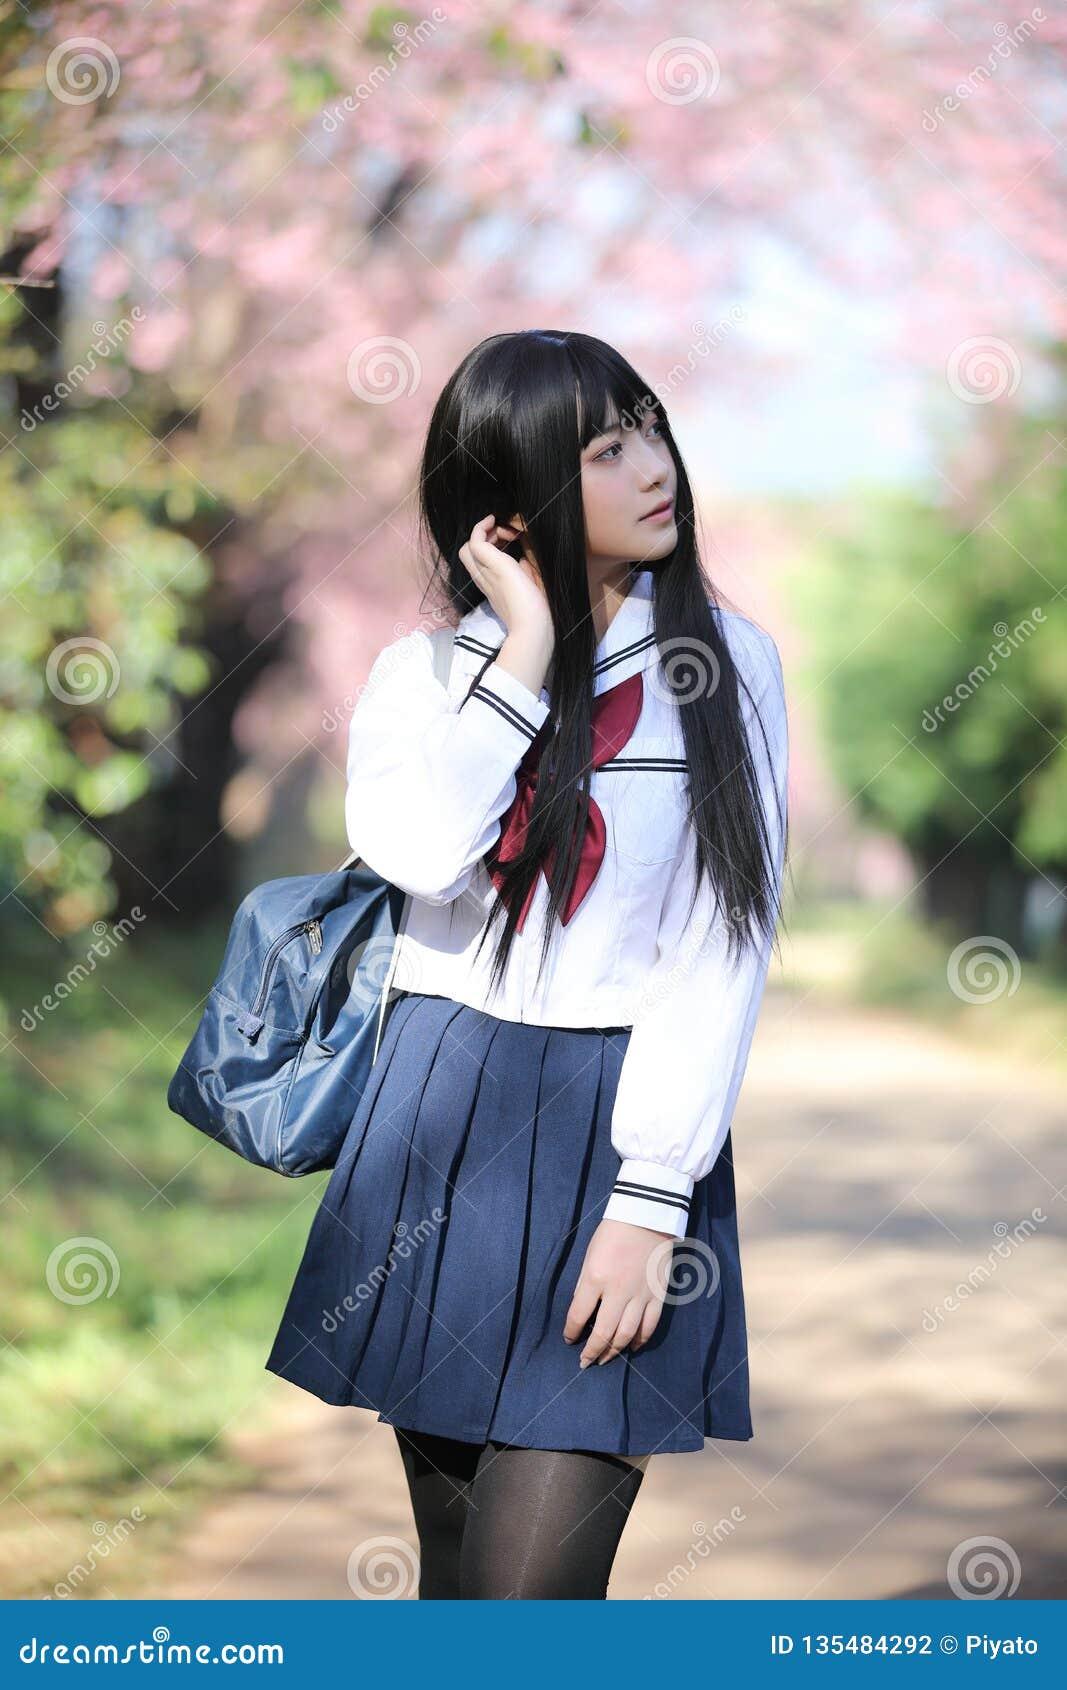 amateur asian girl cheating